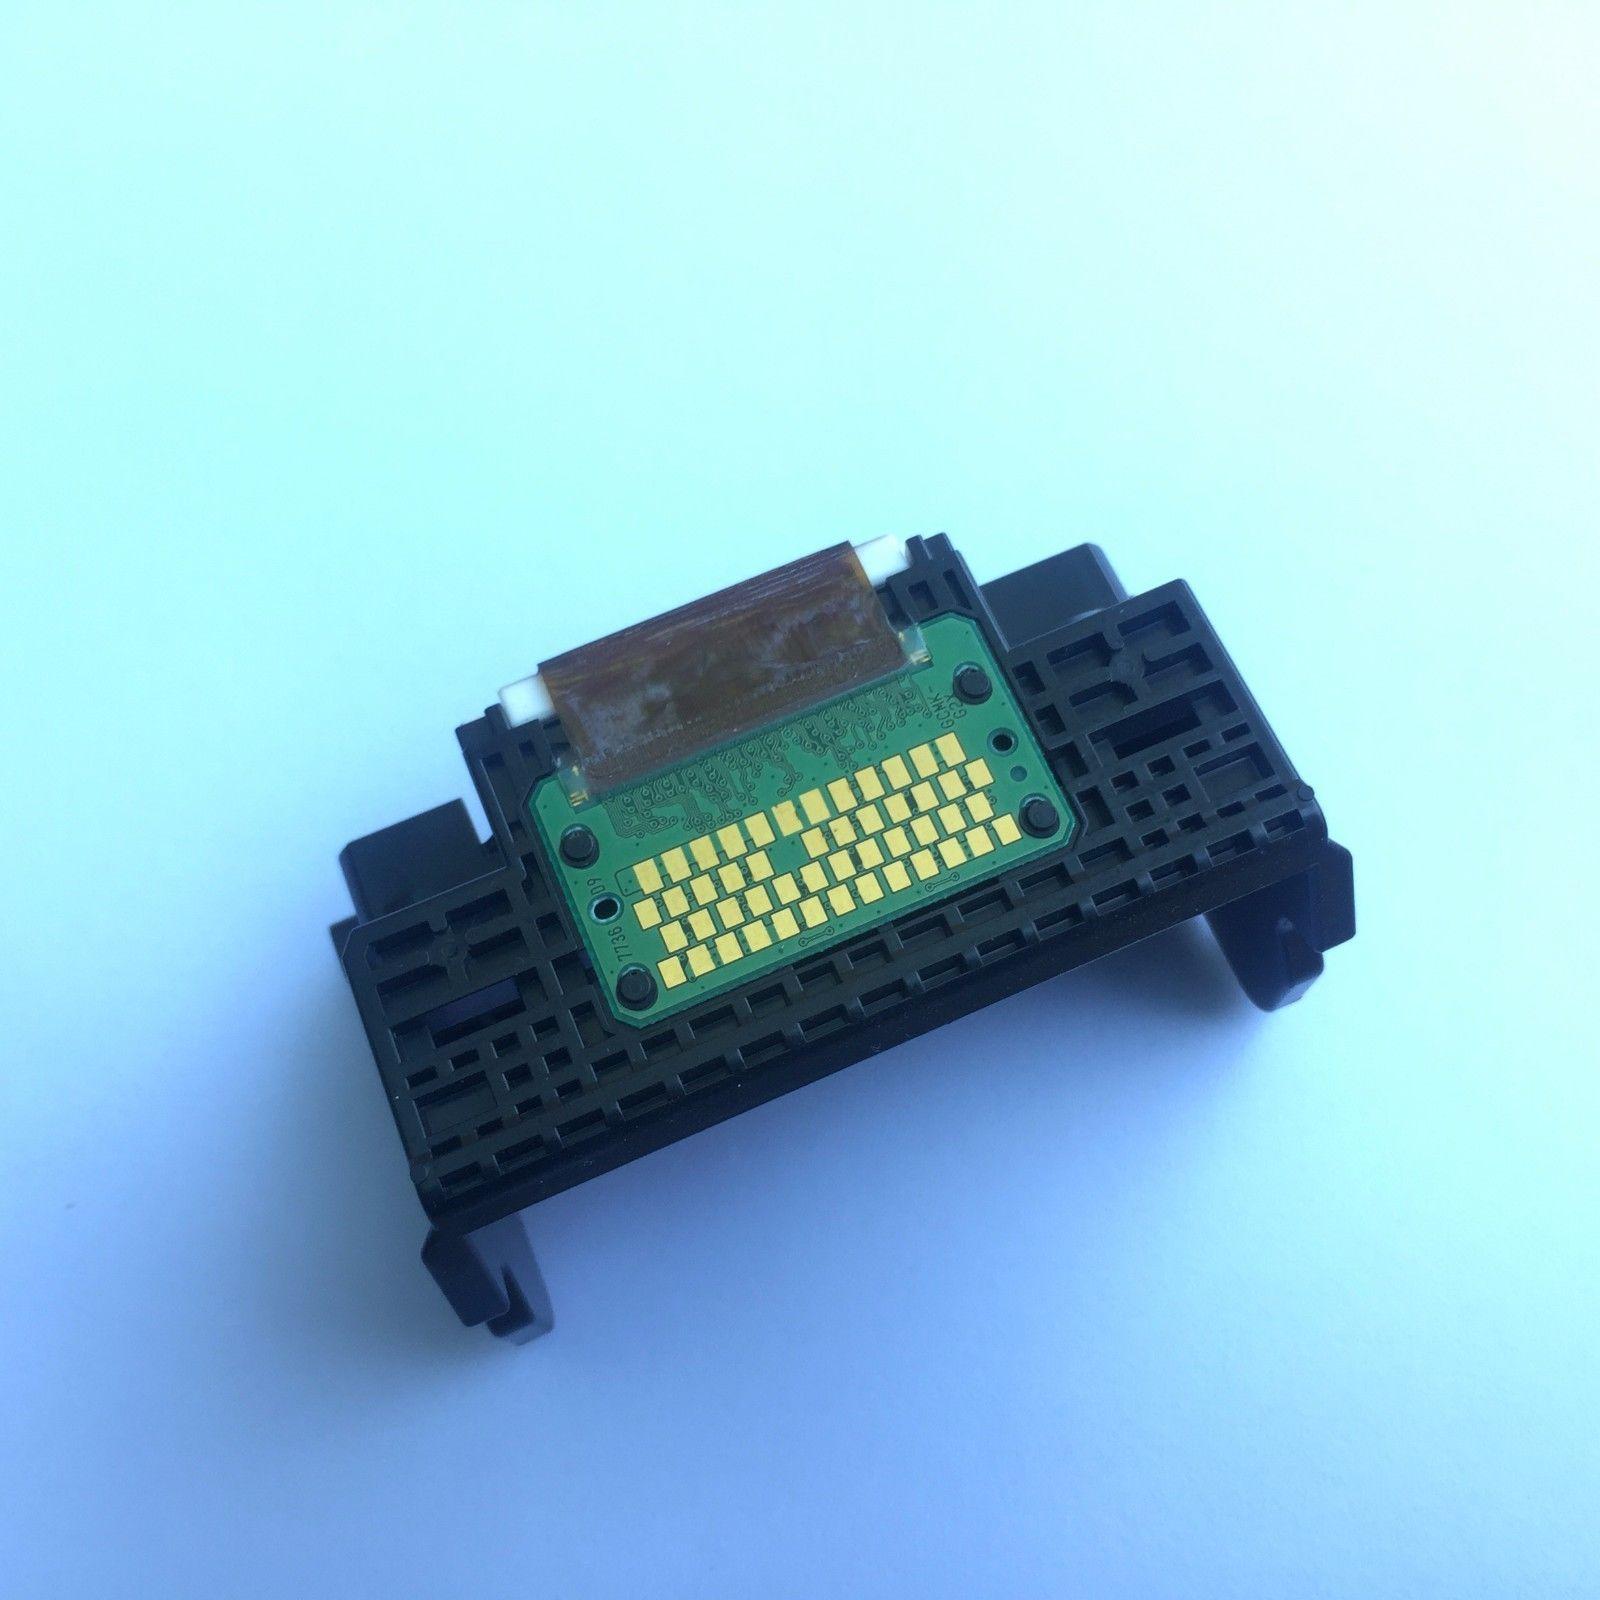 Cabeça de Impressão para Canon Mp630 Mp640 Druckkopf Ip4600 Qy6-0072 Ip4680 Ip4700 Ip4760